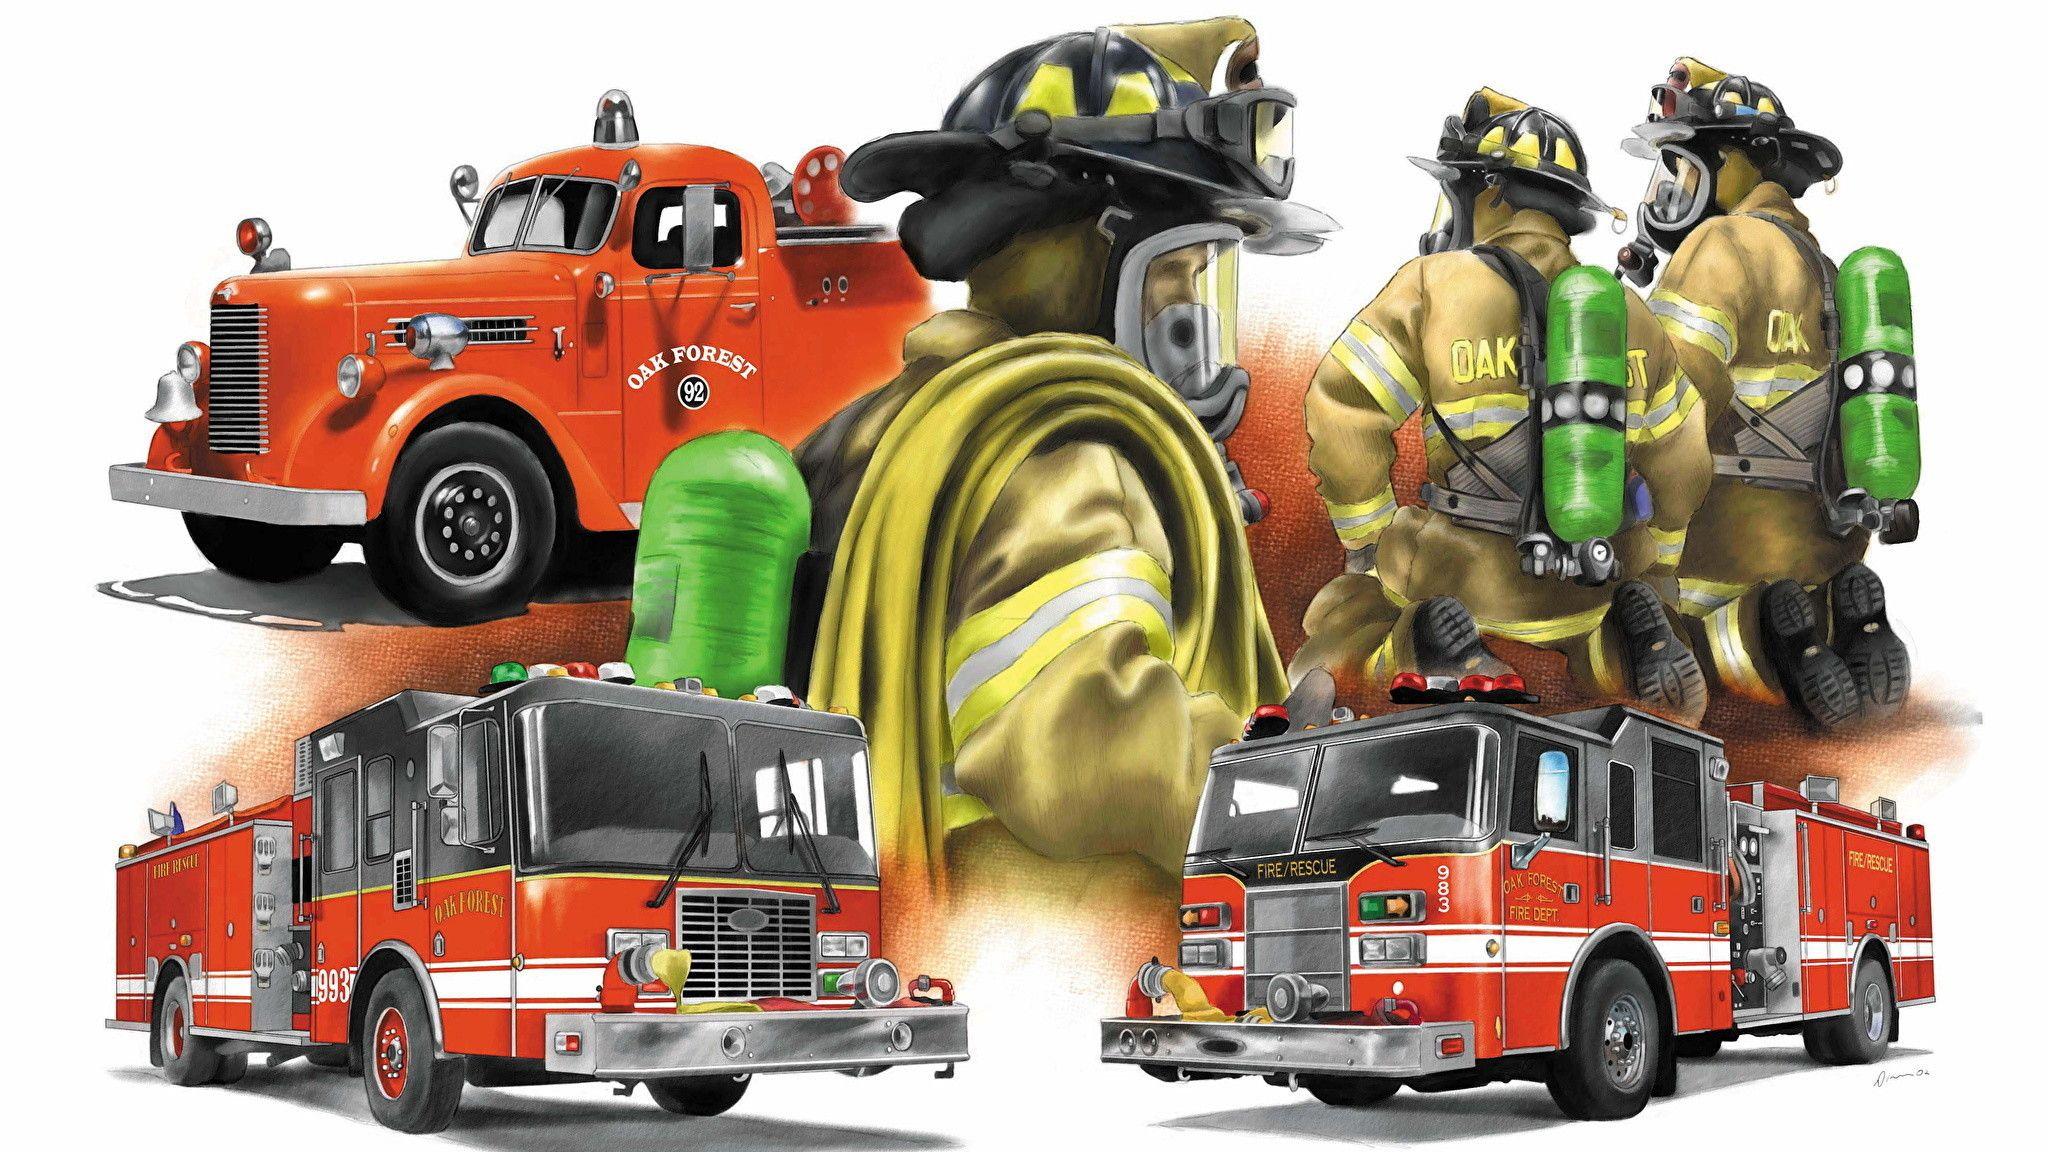 62 Firefighter Desktop Wallpapers On Wallpaperplay Desktop Wallpaper Firefighter Navy Seal Wallpaper